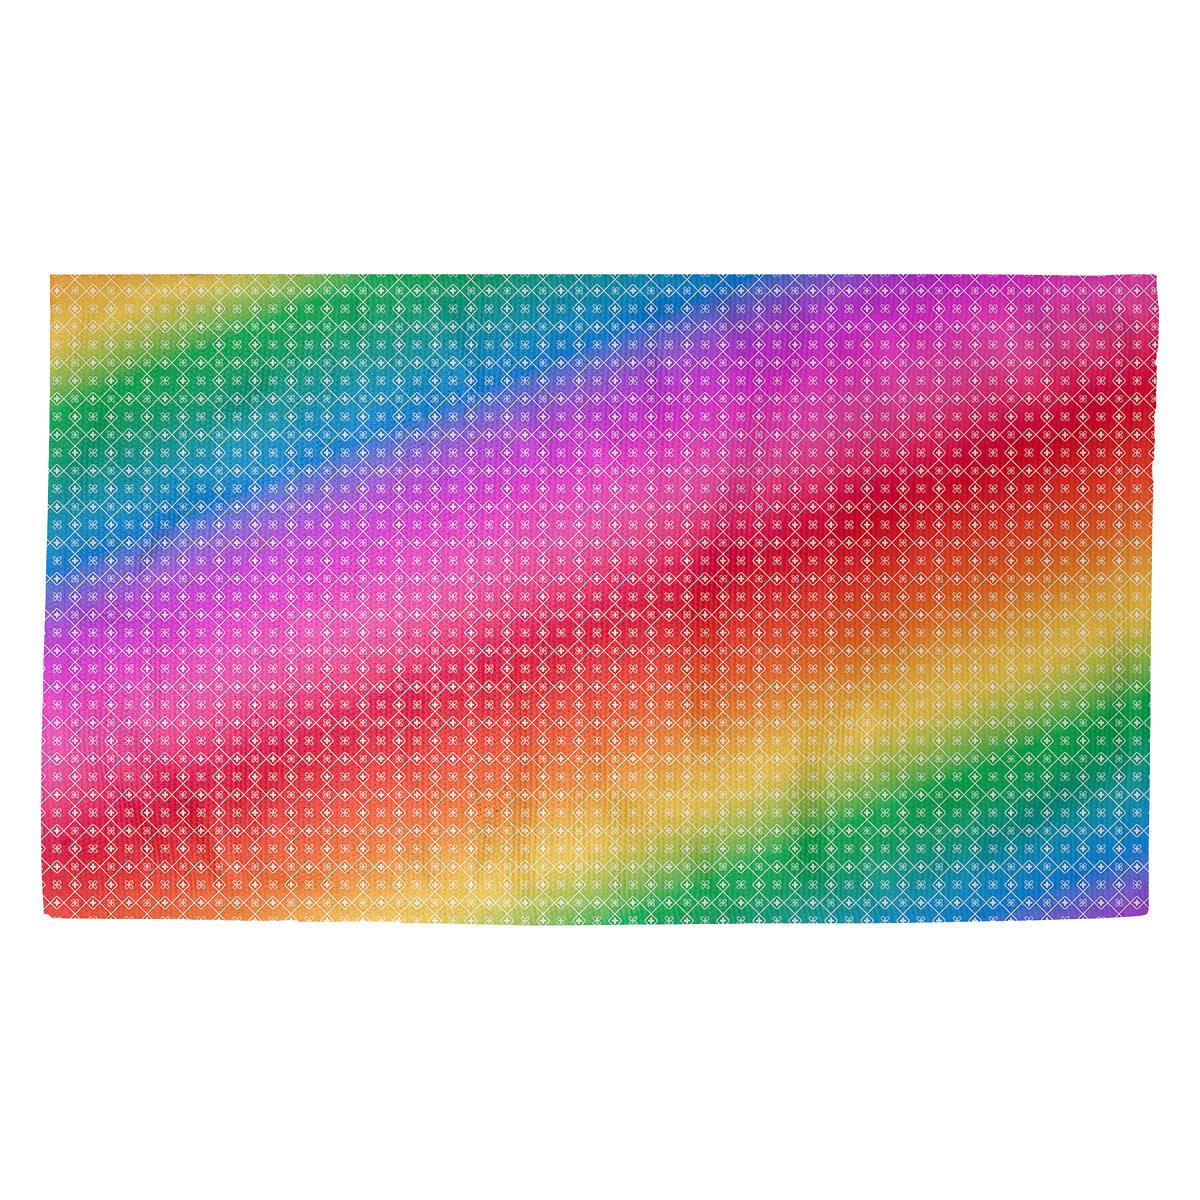 Latitude Run Avicia Doily Pink/Yellow/Green Area Rug